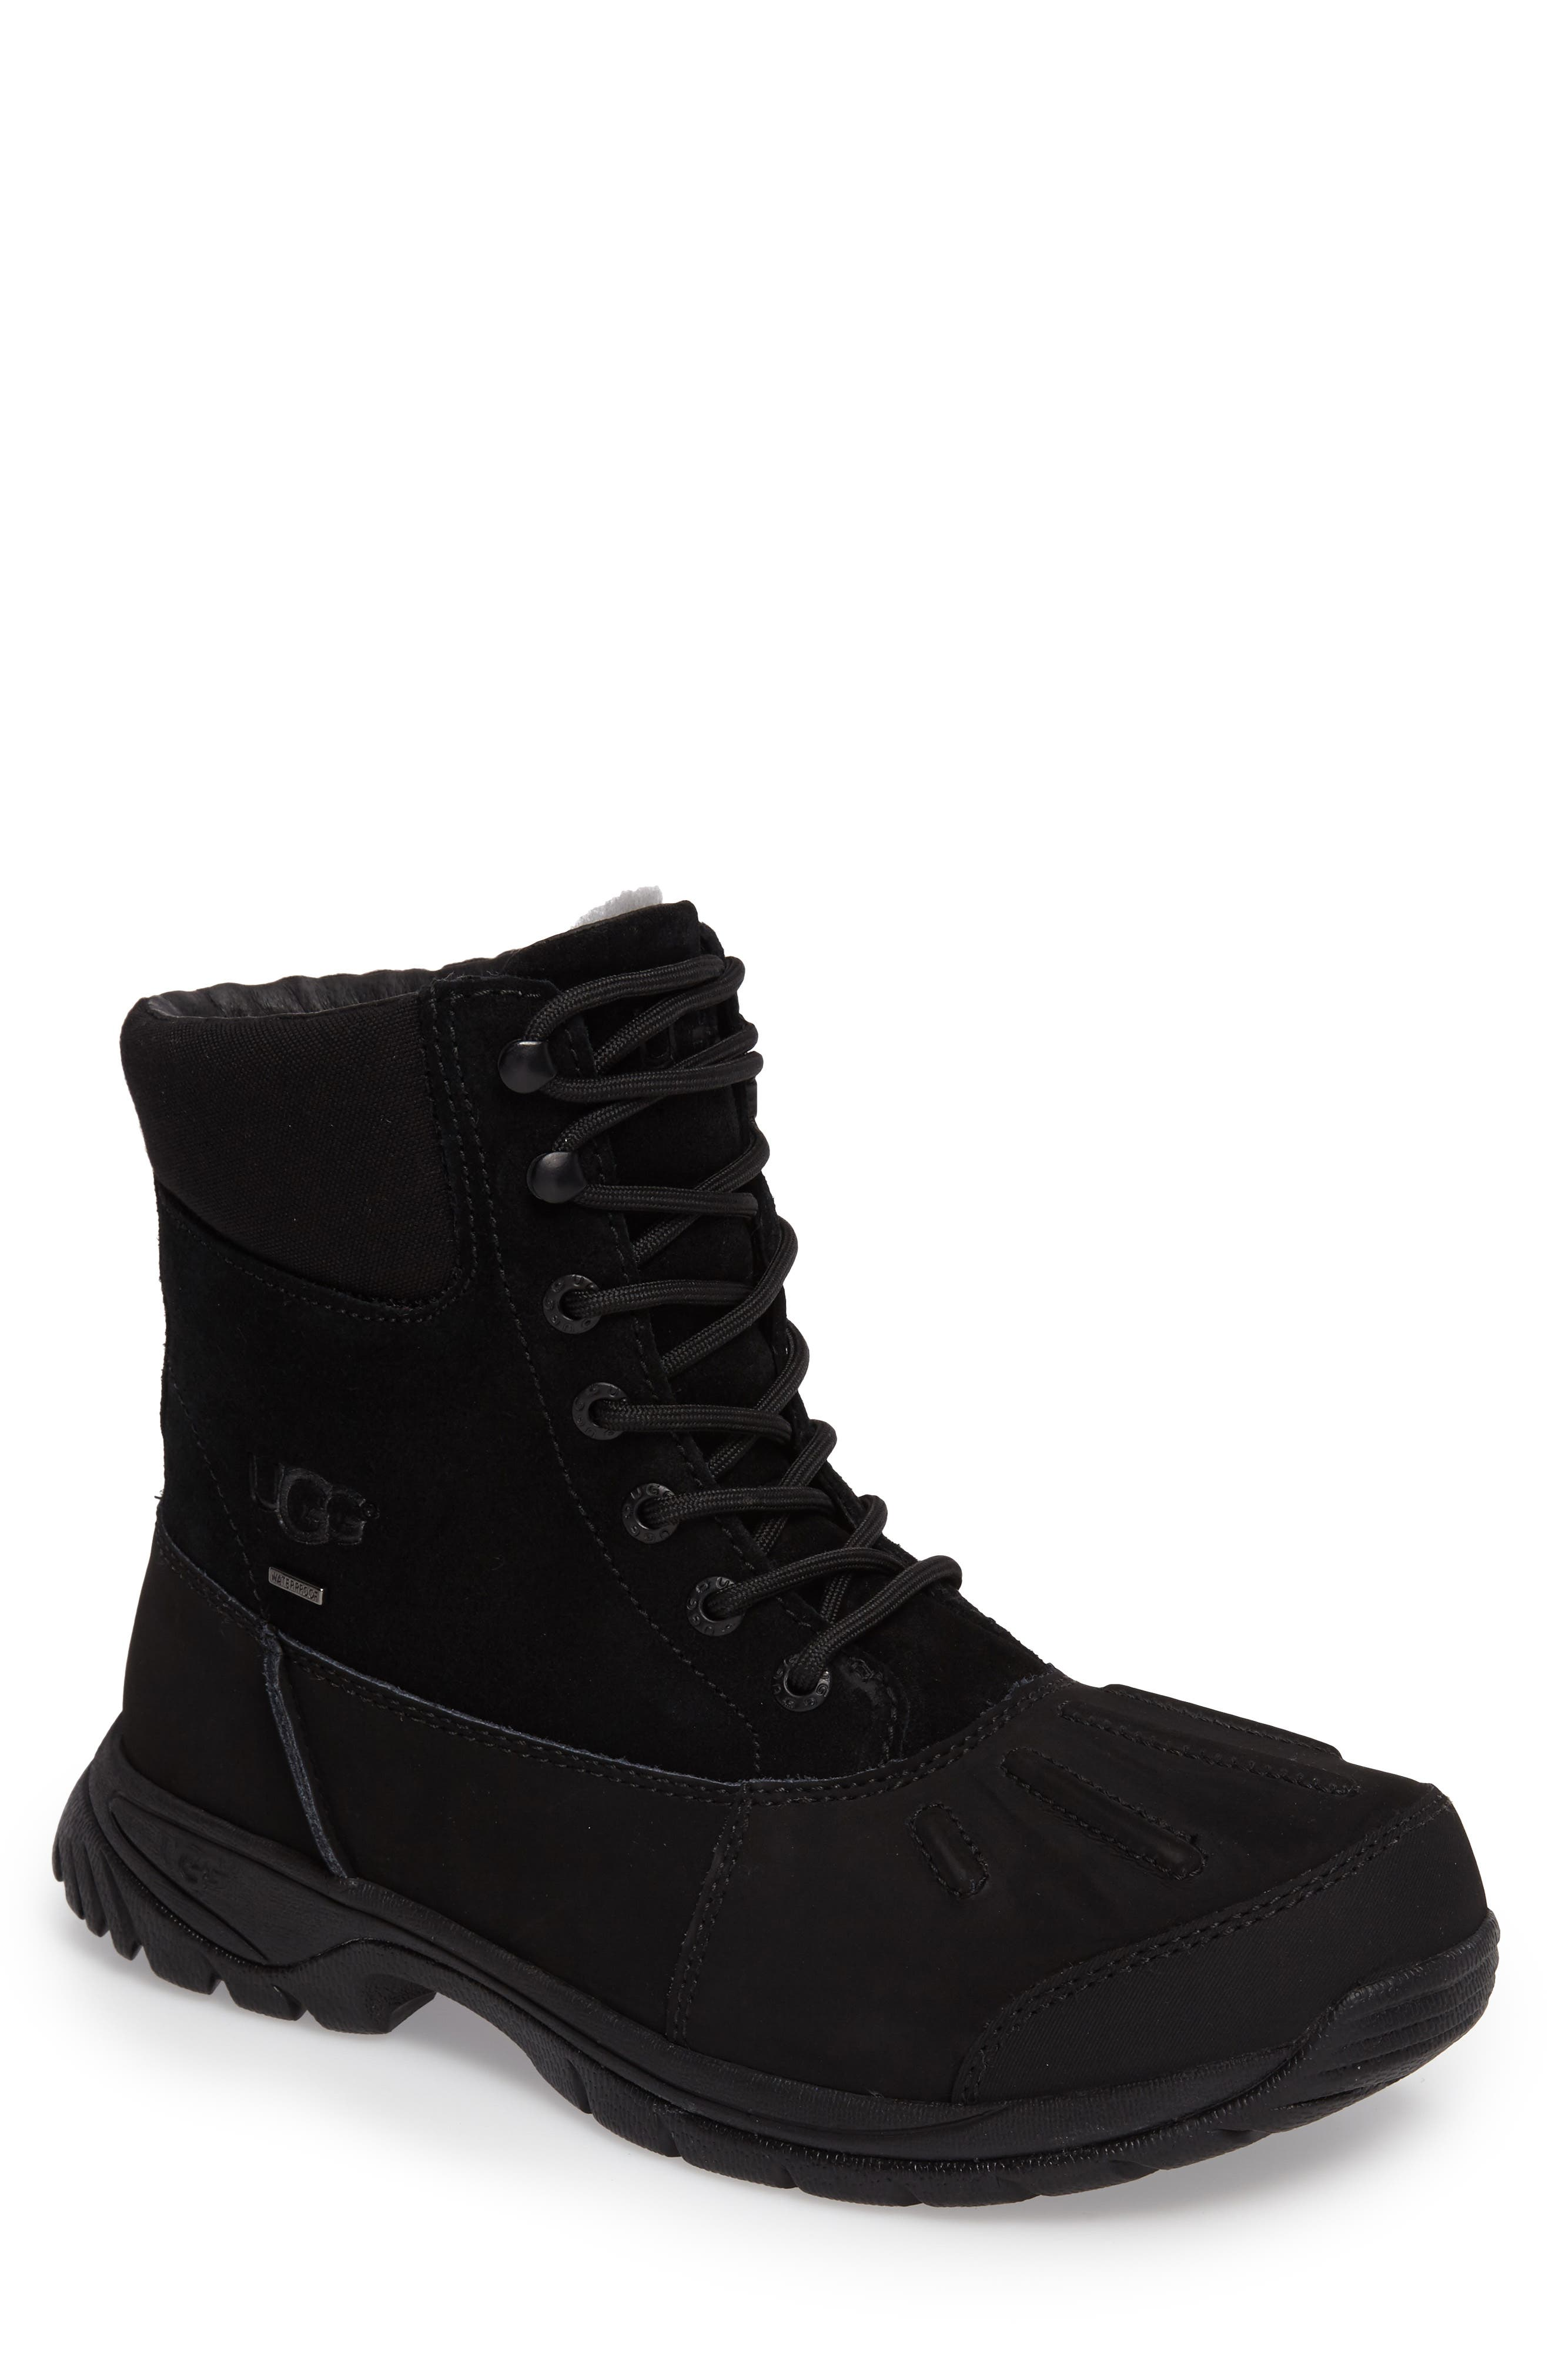 'Metcalf' Snow Boot,                             Main thumbnail 1, color,                             001